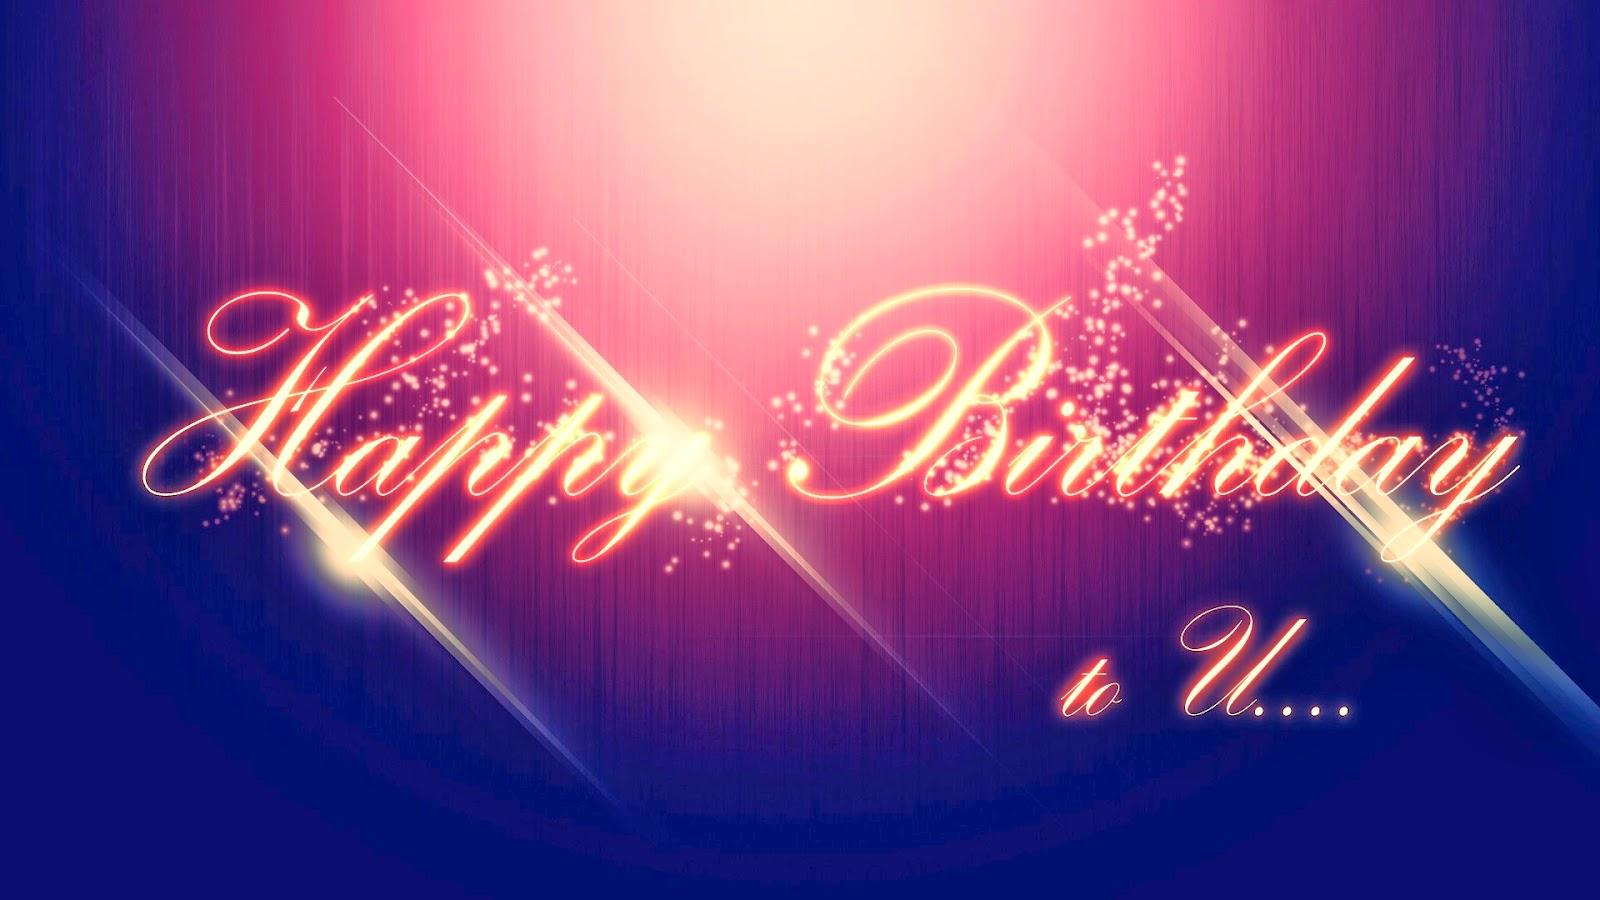 Happy birthday wishes wish spark lights